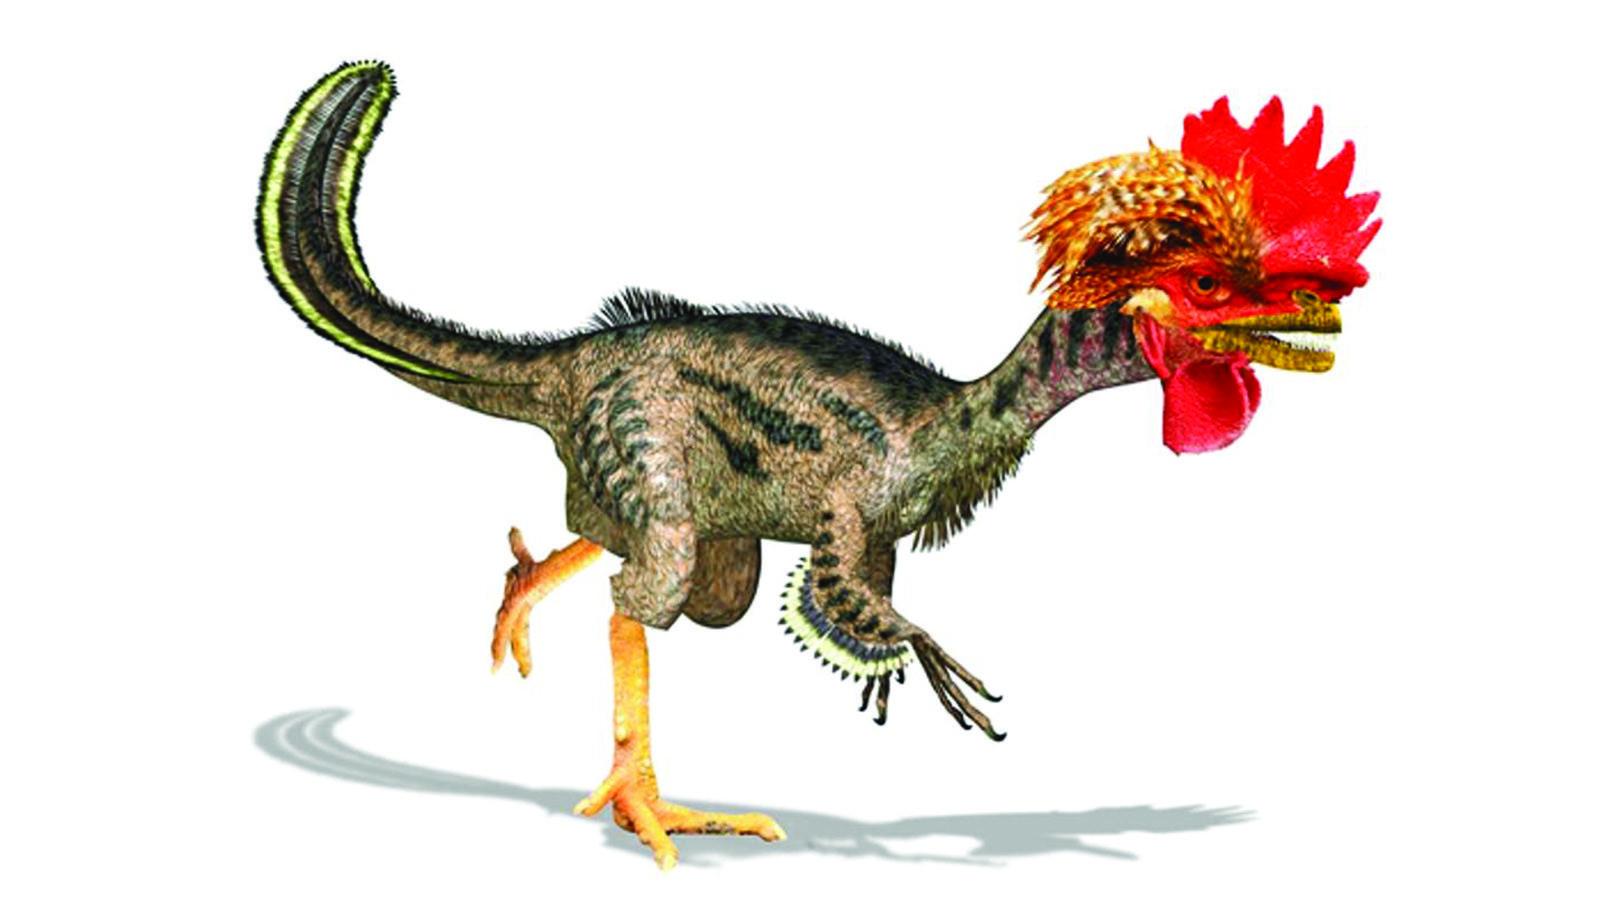 Turning Birds into Dinosaurs, the dino-chicken